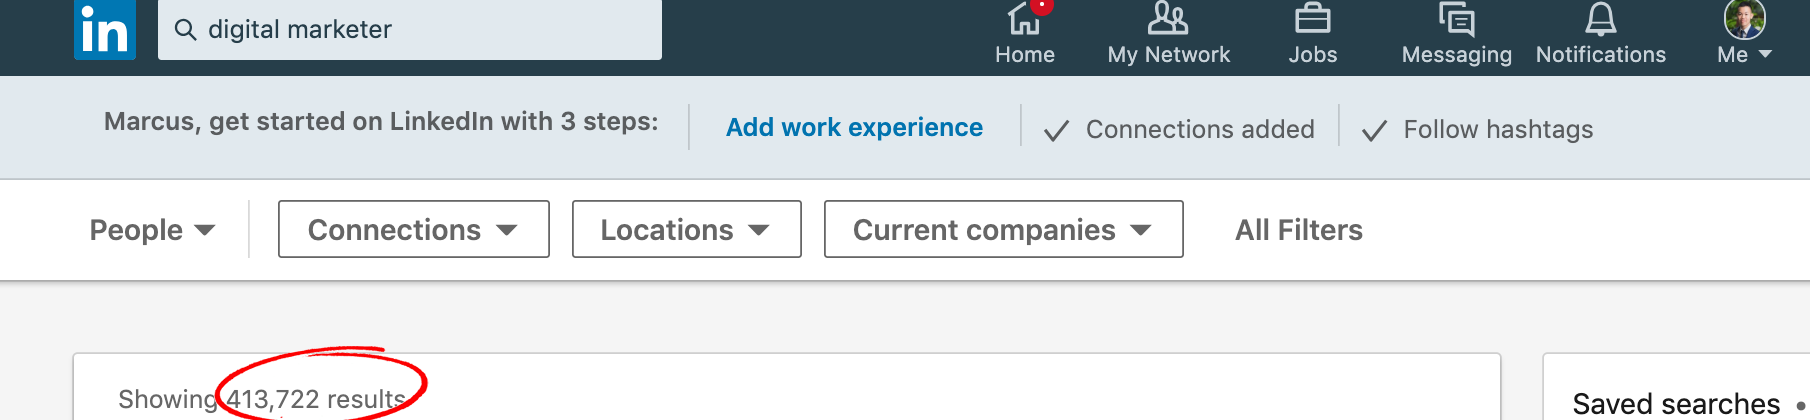 LinkedIn Digital Marketers